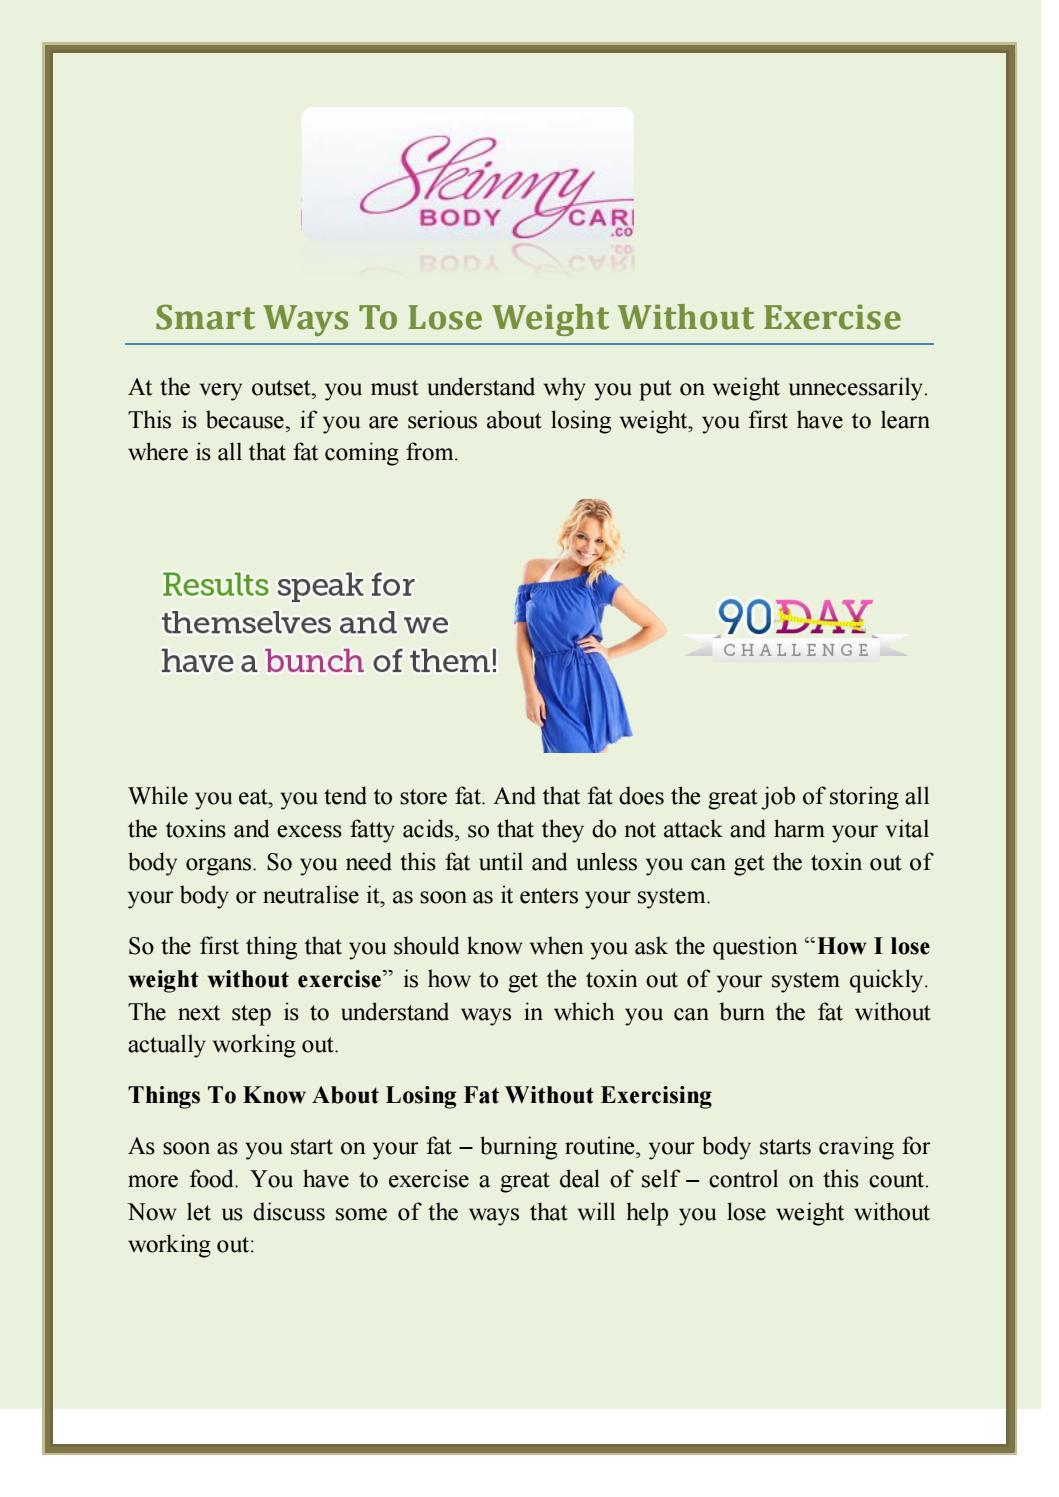 Smart Ways To Lose Weight Without Exercise By Jessicabeak Issuu